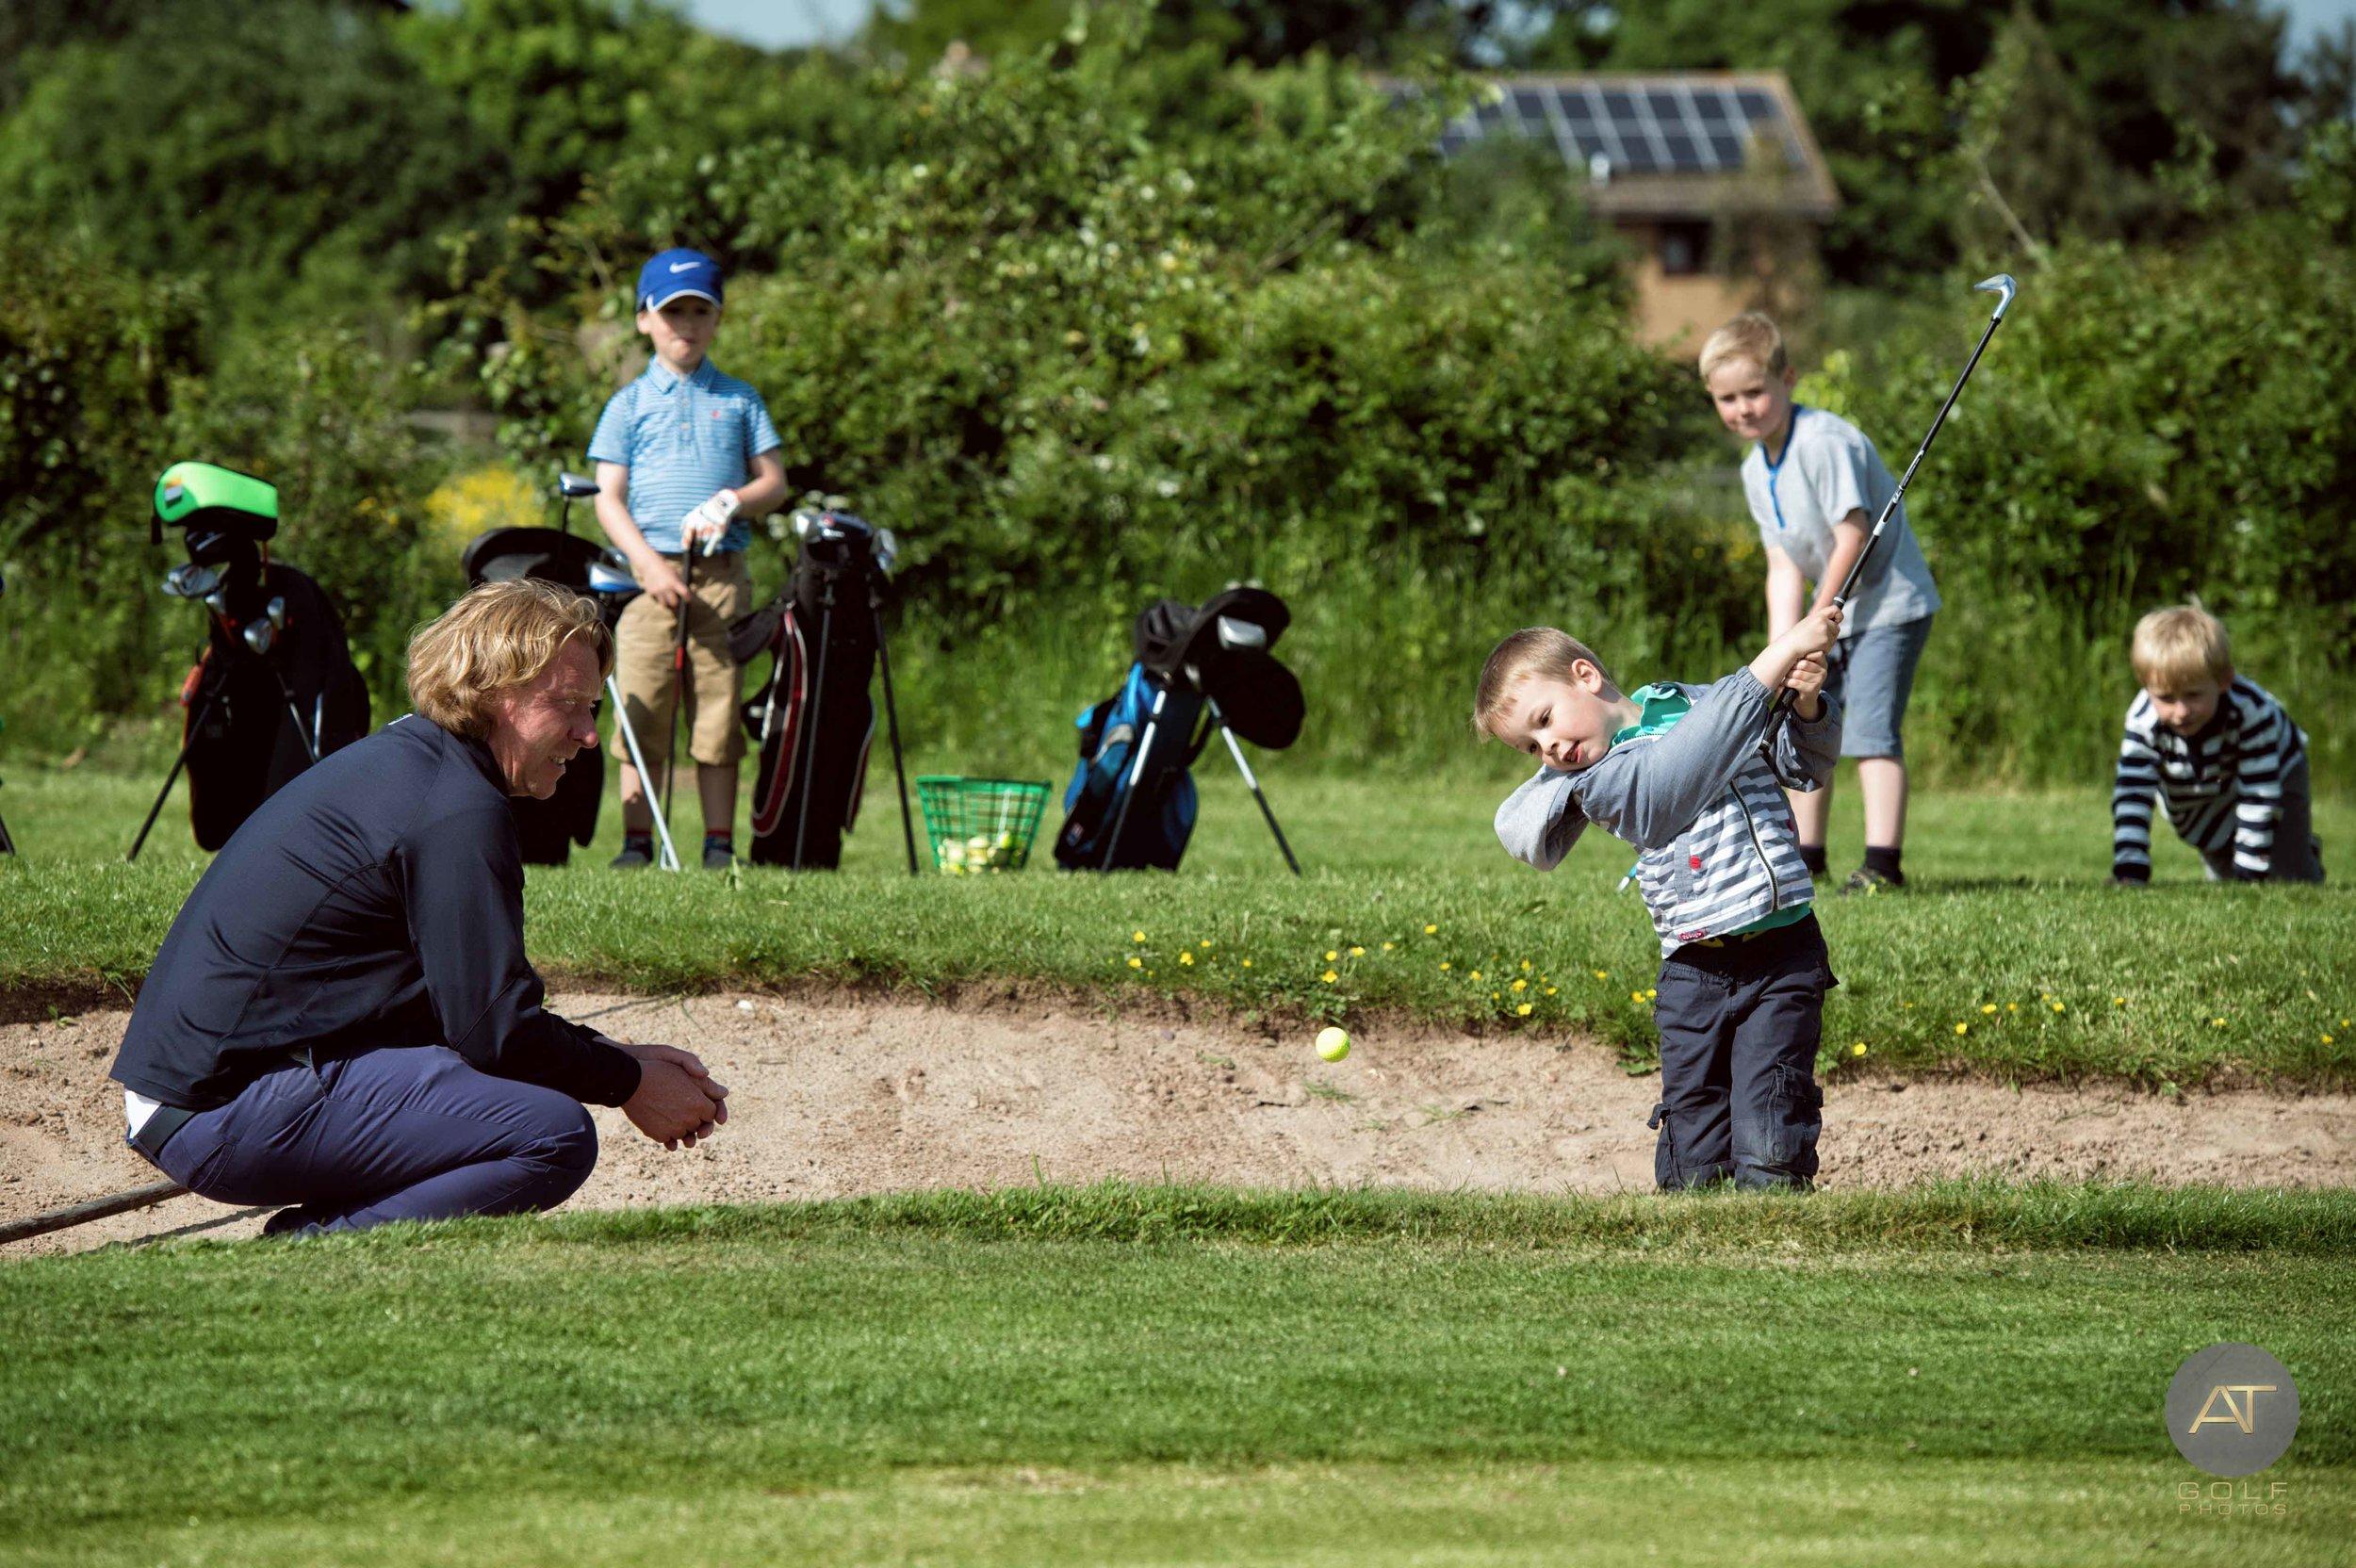 Russell Adams Junior Golf Academy Hadzor Aniko Towers Golf photos-31.jpg